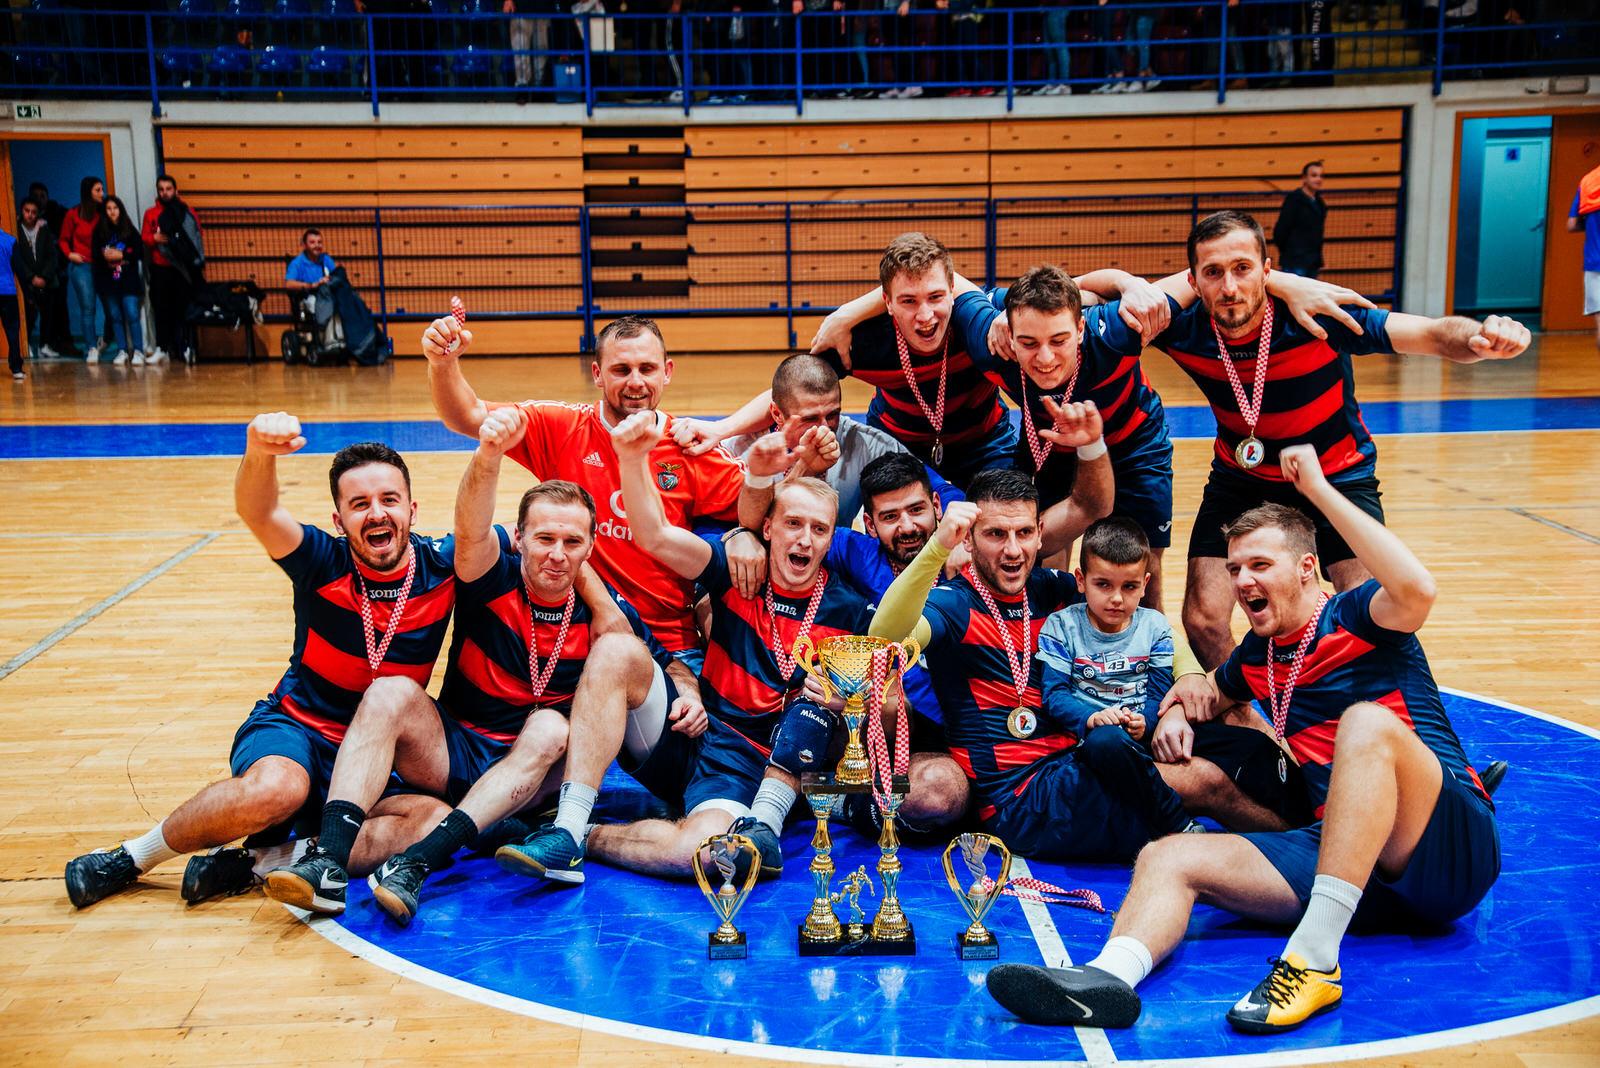 likaclub_zimska-malonogometna-liga-gospić_2019-20-146